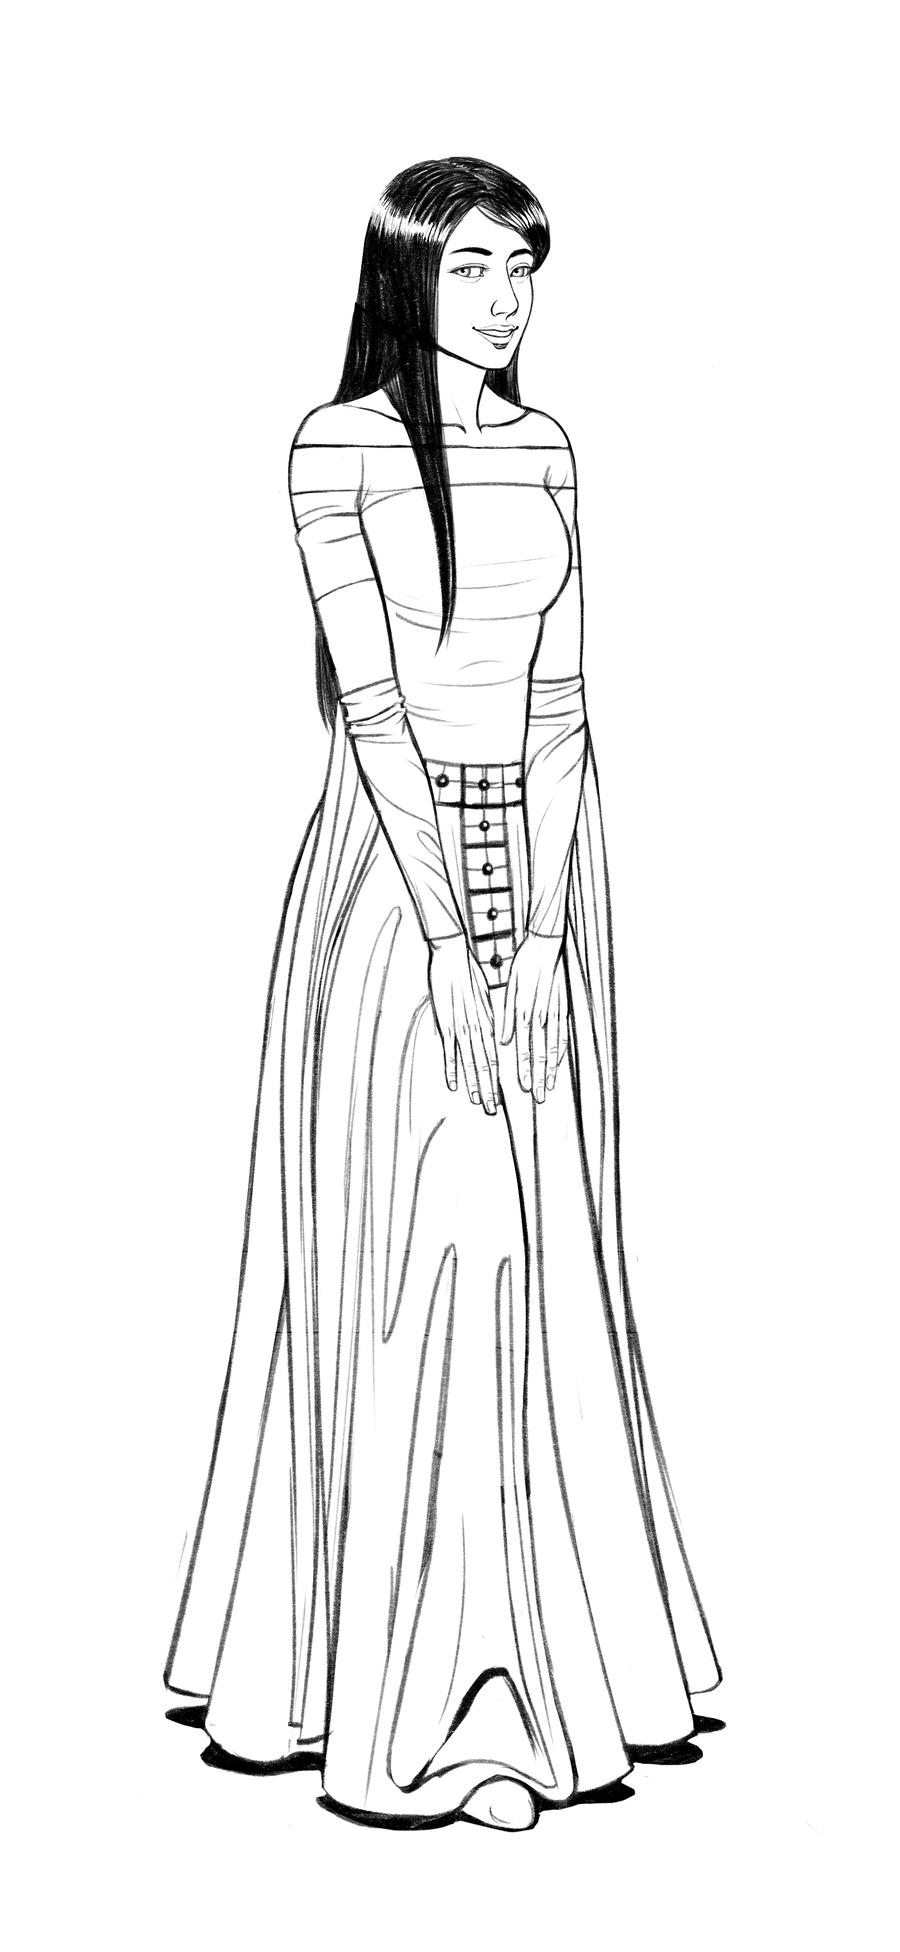 900x1952 Sketch Medieval Lady By Blackdeathman